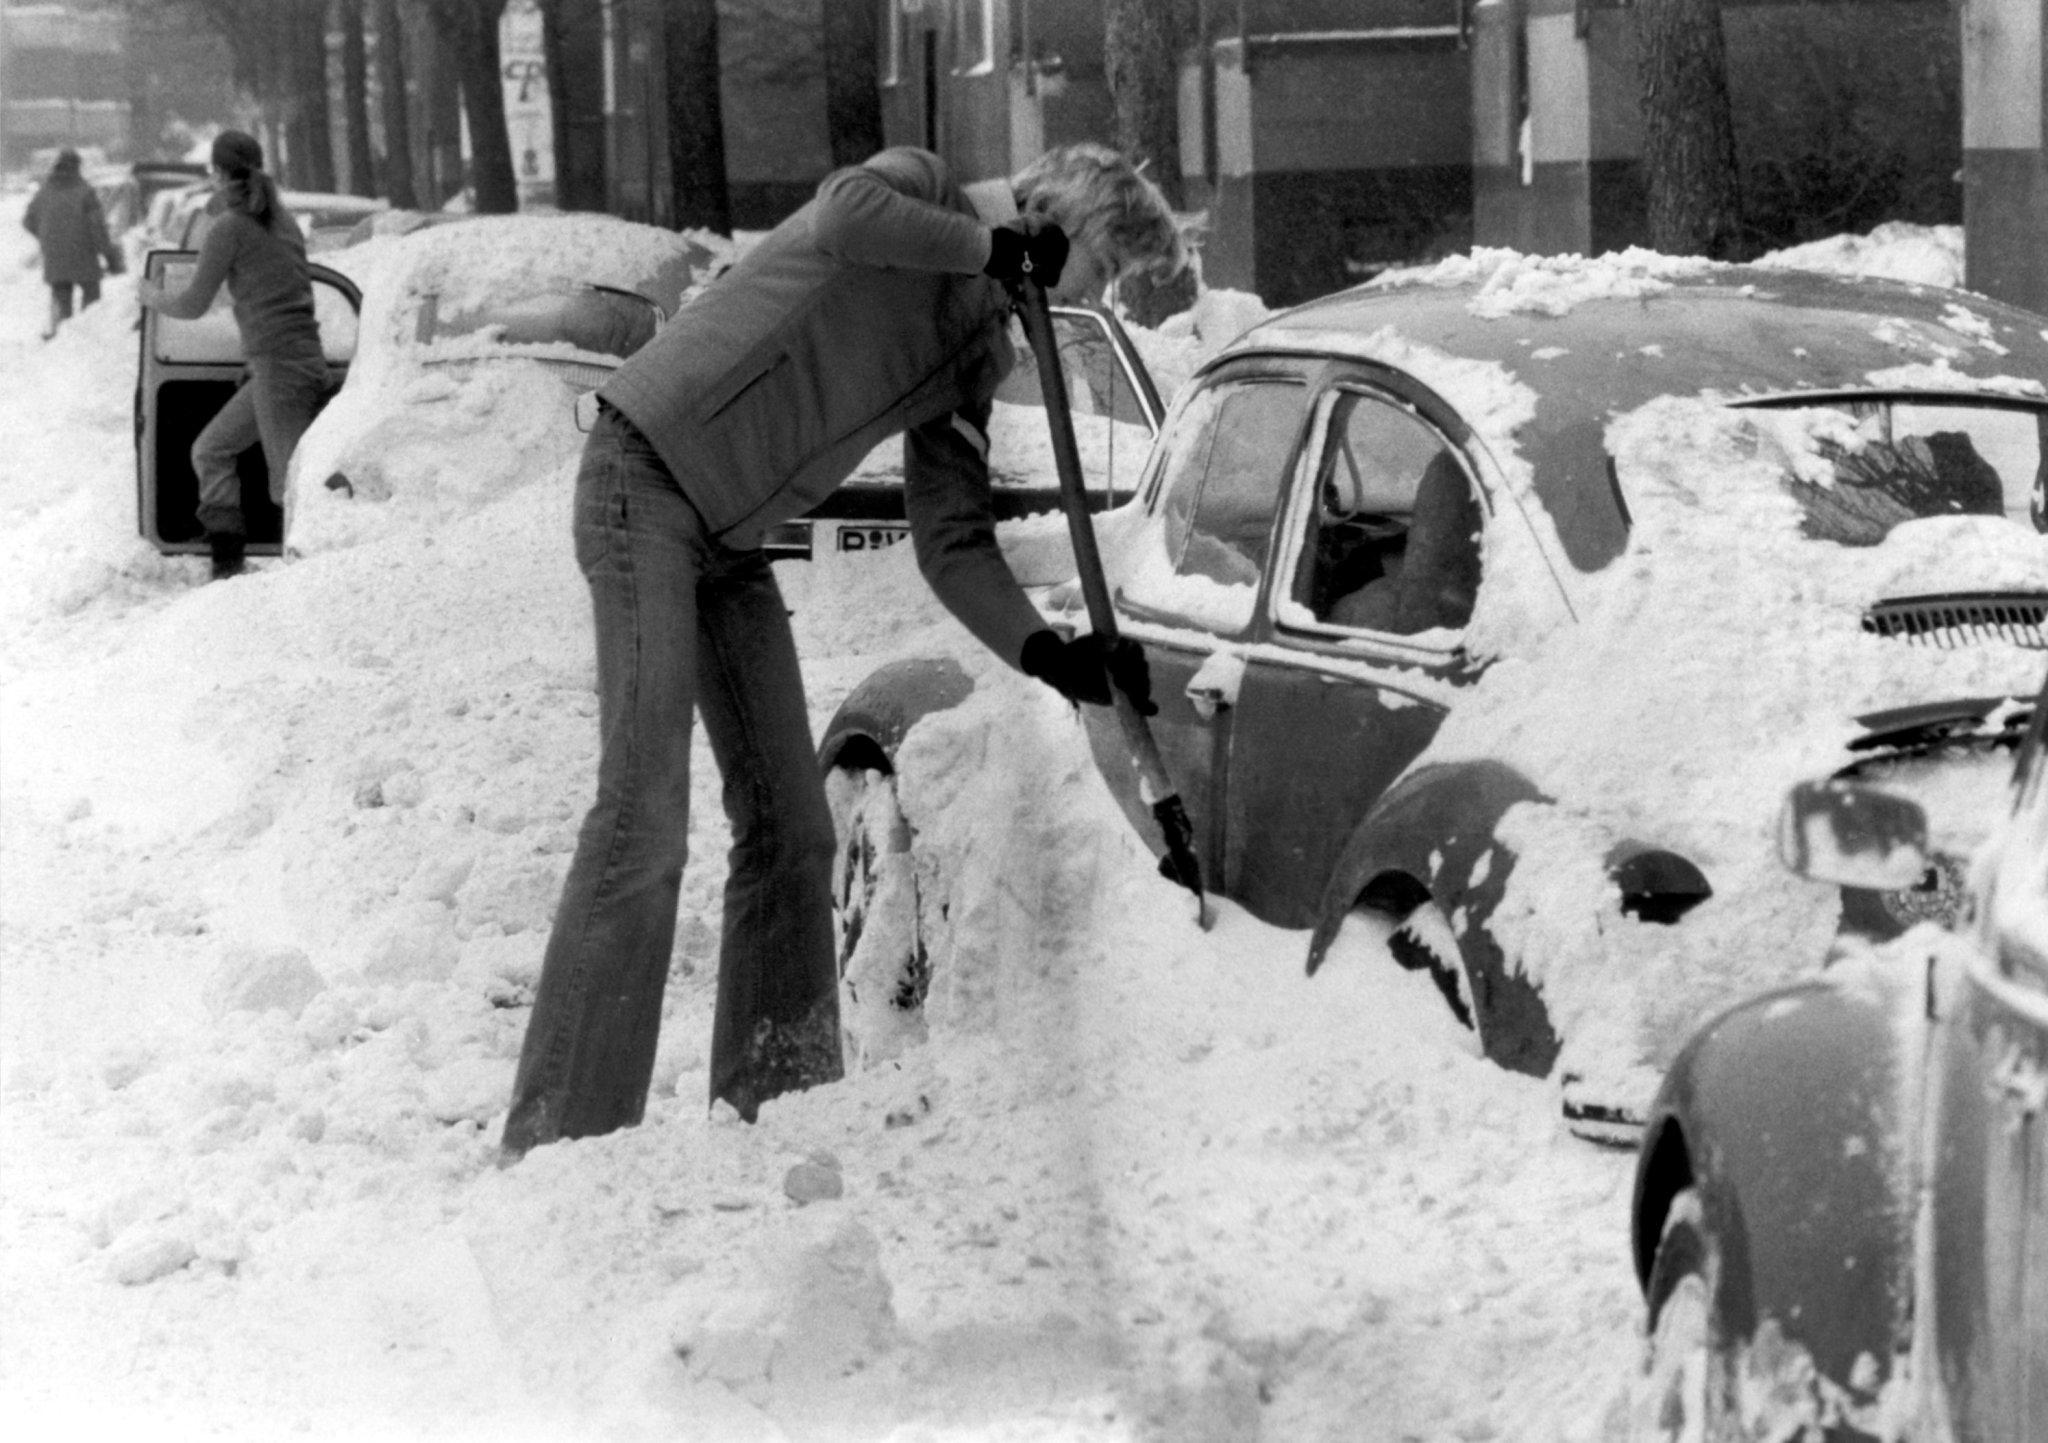 Winter 1978